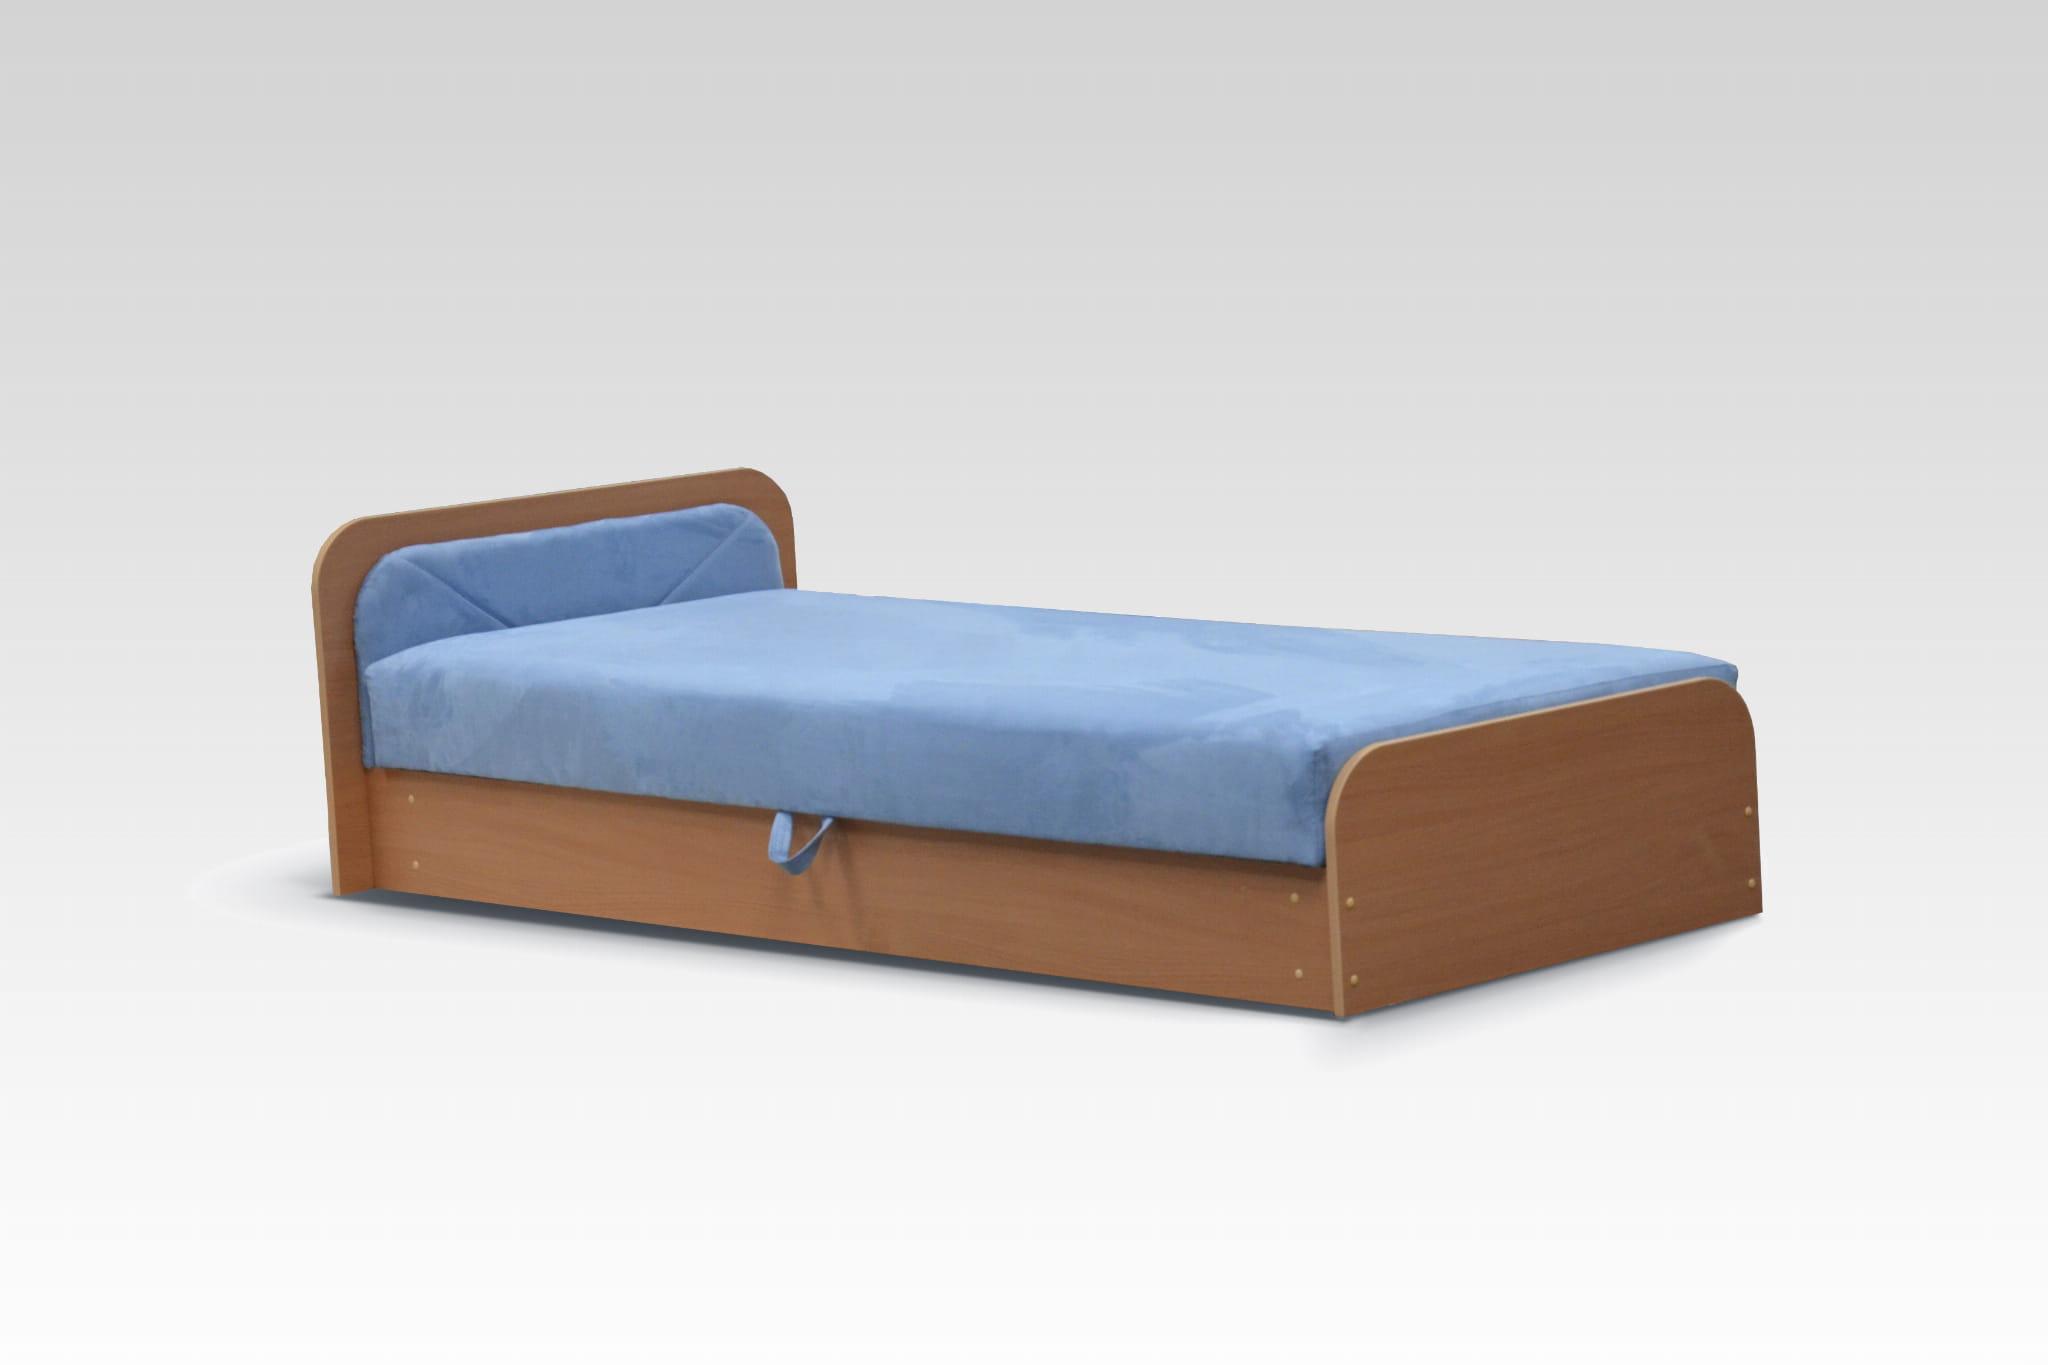 tapczan parys szeroko 80 cm meble. Black Bedroom Furniture Sets. Home Design Ideas